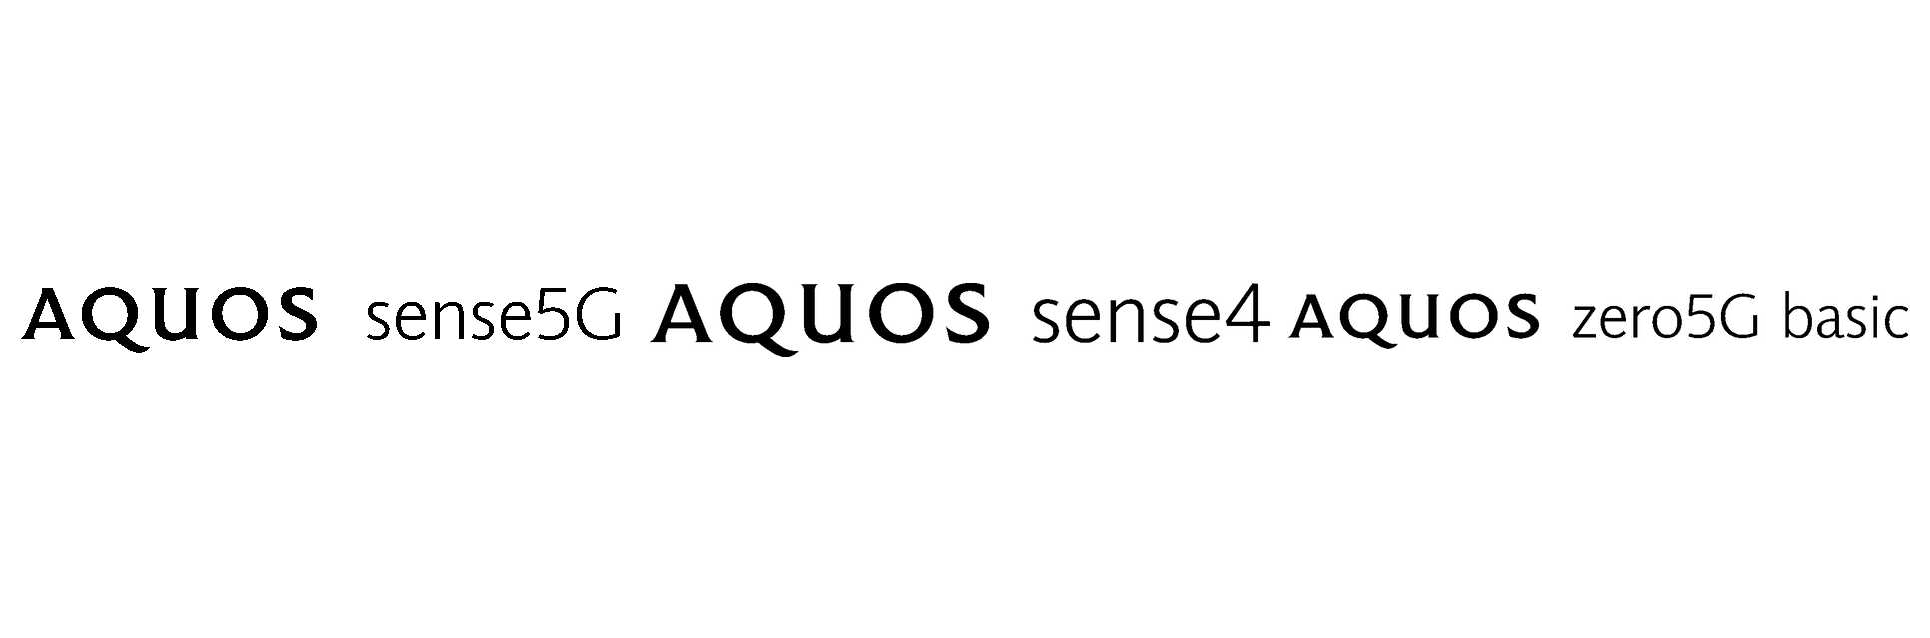 SHARPがAQUOS sense 4シリーズやAQUOS sense5G、AQUOS zero5Gの商標を出願